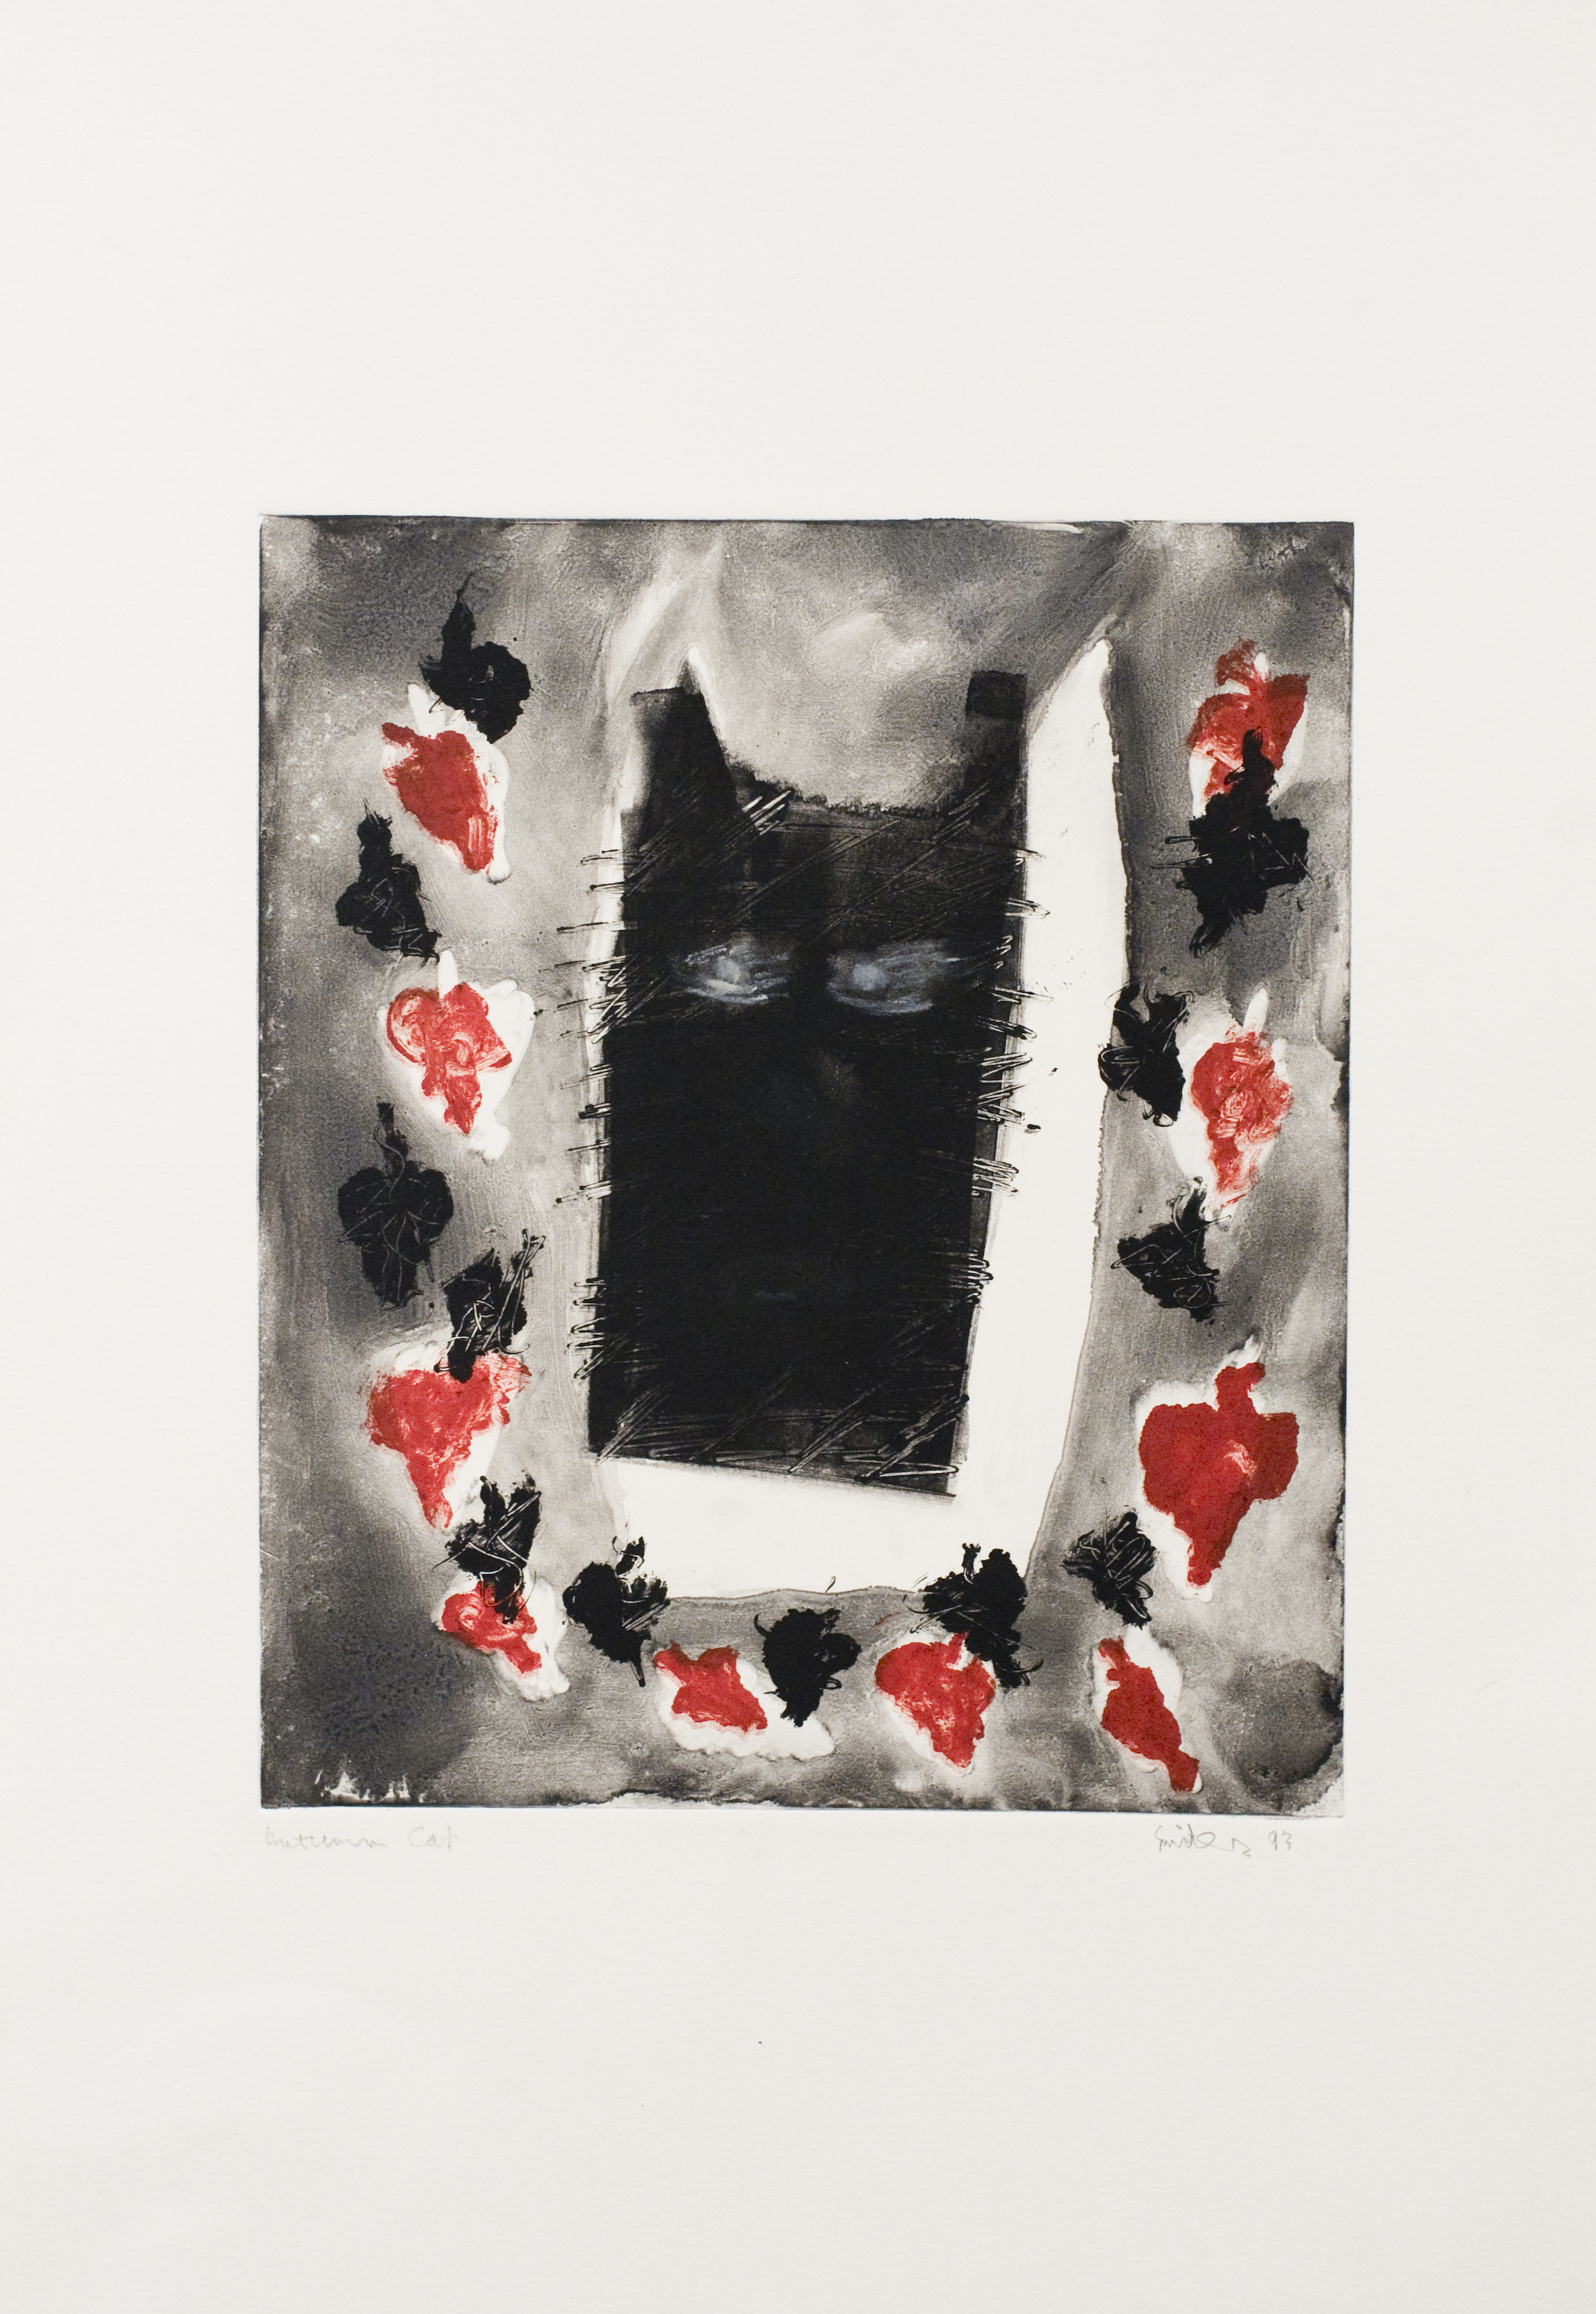 Jenny Snider,  Autumn Cat,  1993, monoprint, 22h x 15w in.